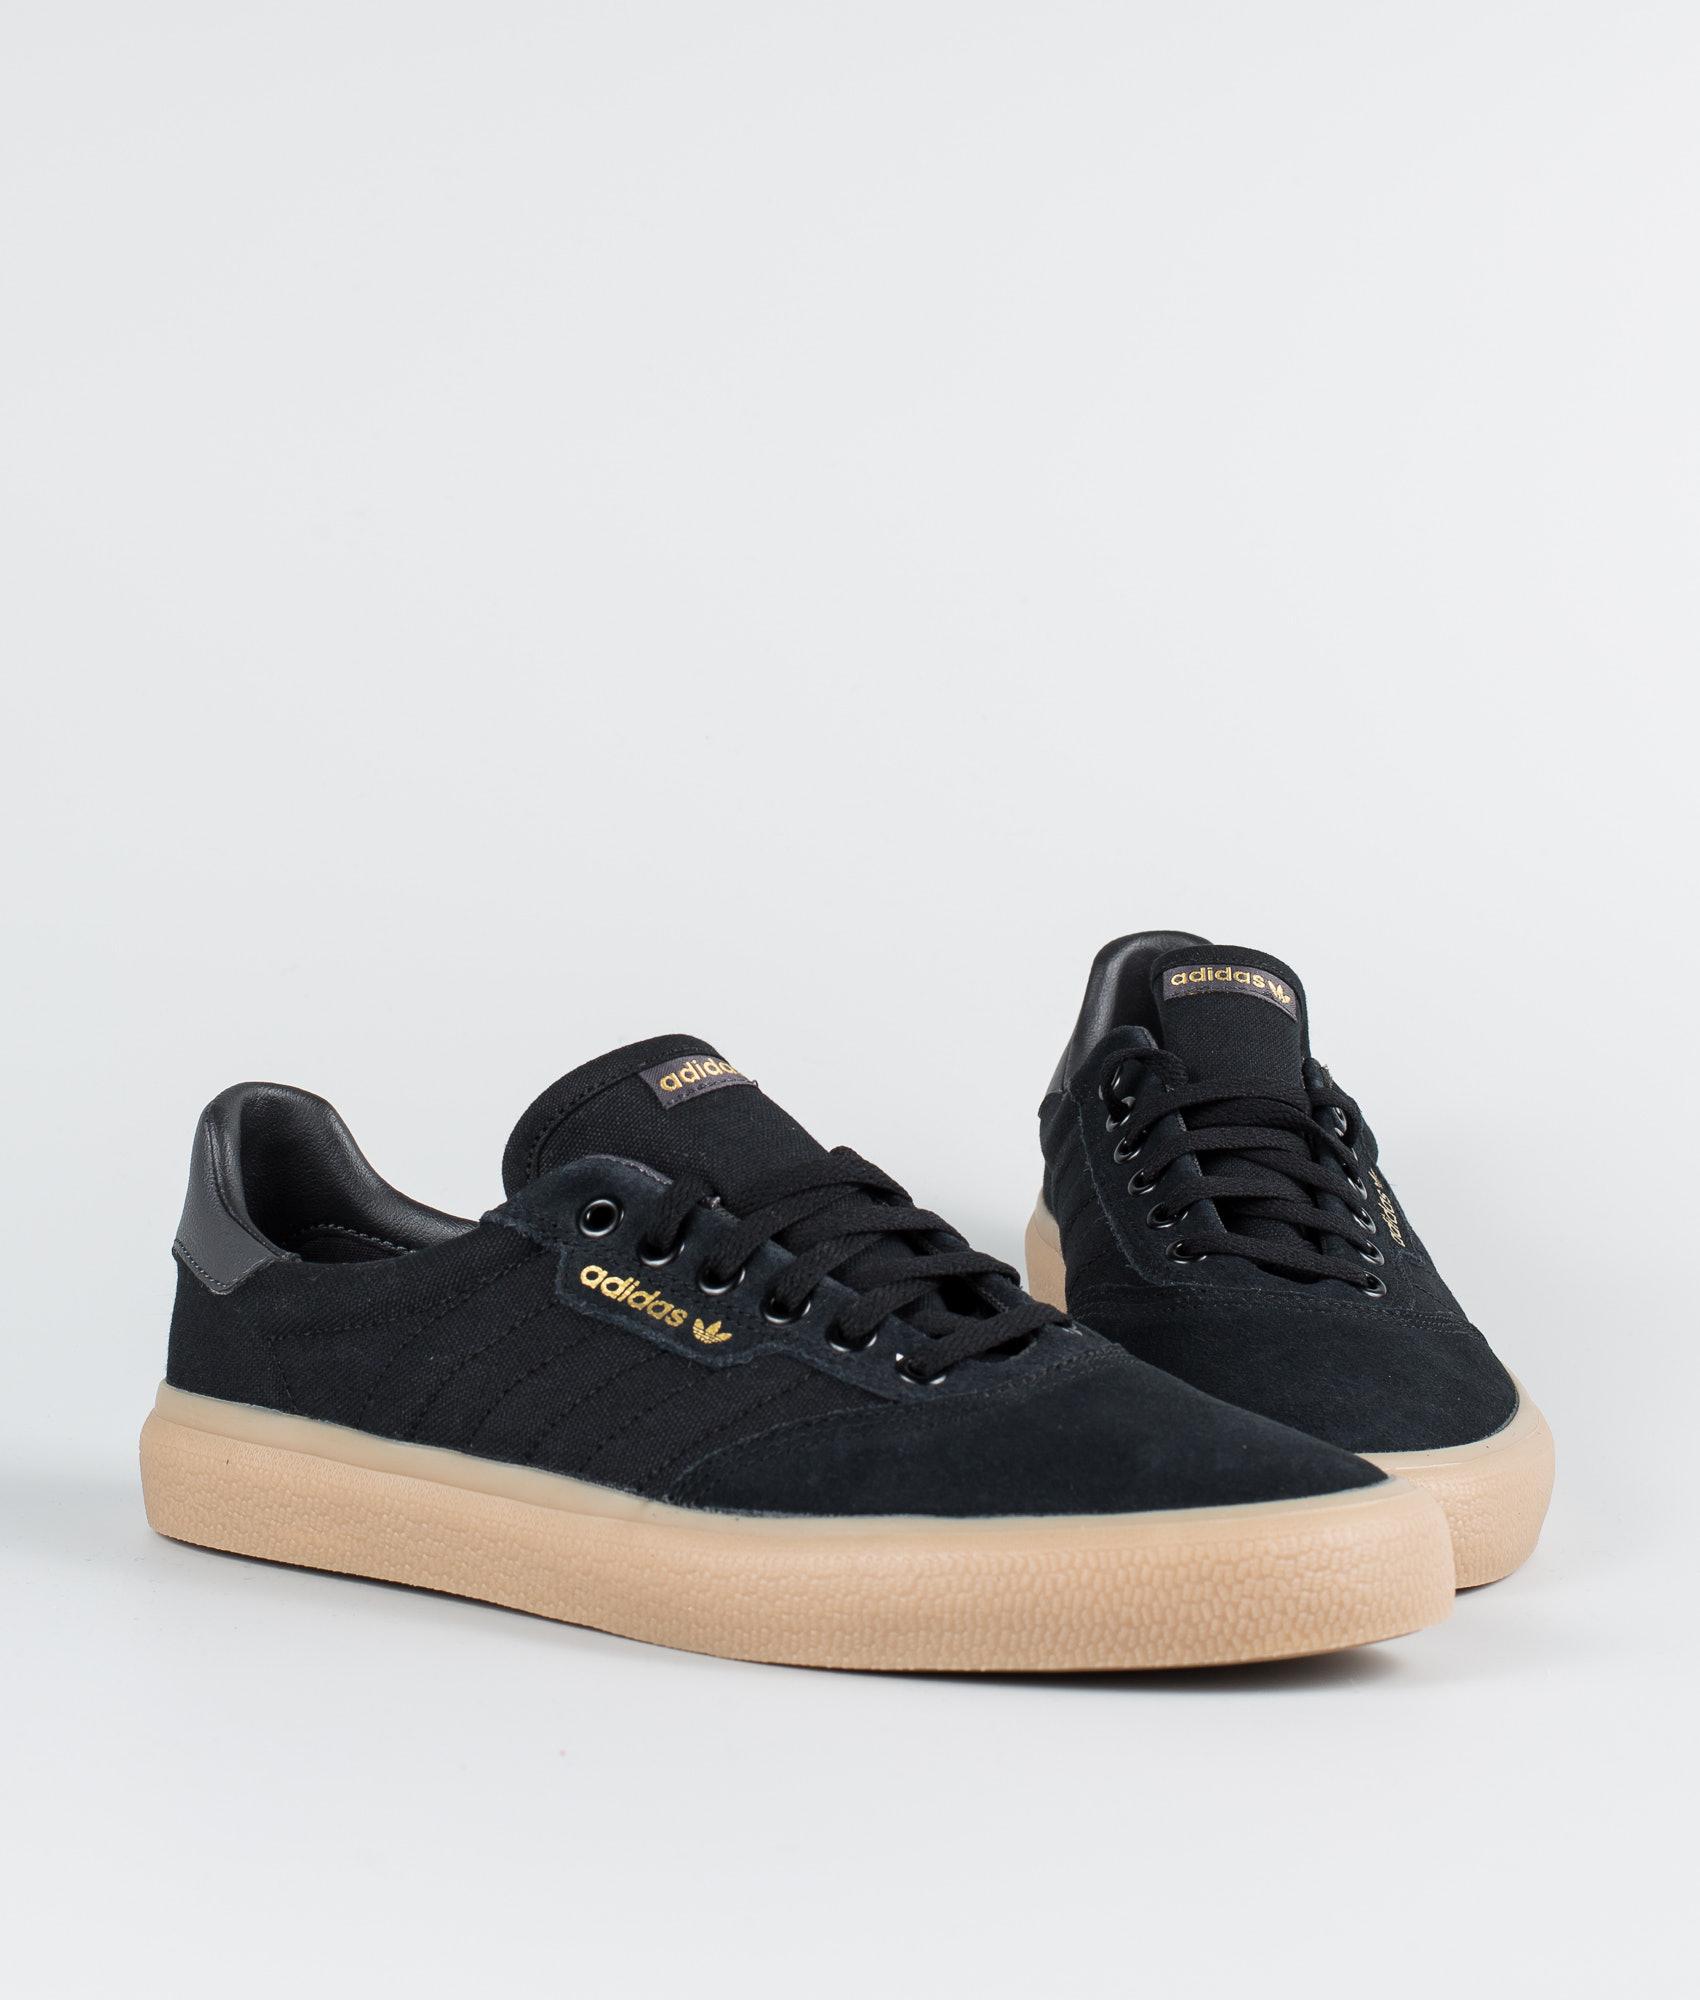 online store 1a0e4 02c72 Adidas Skateboarding 3Mc Shoes